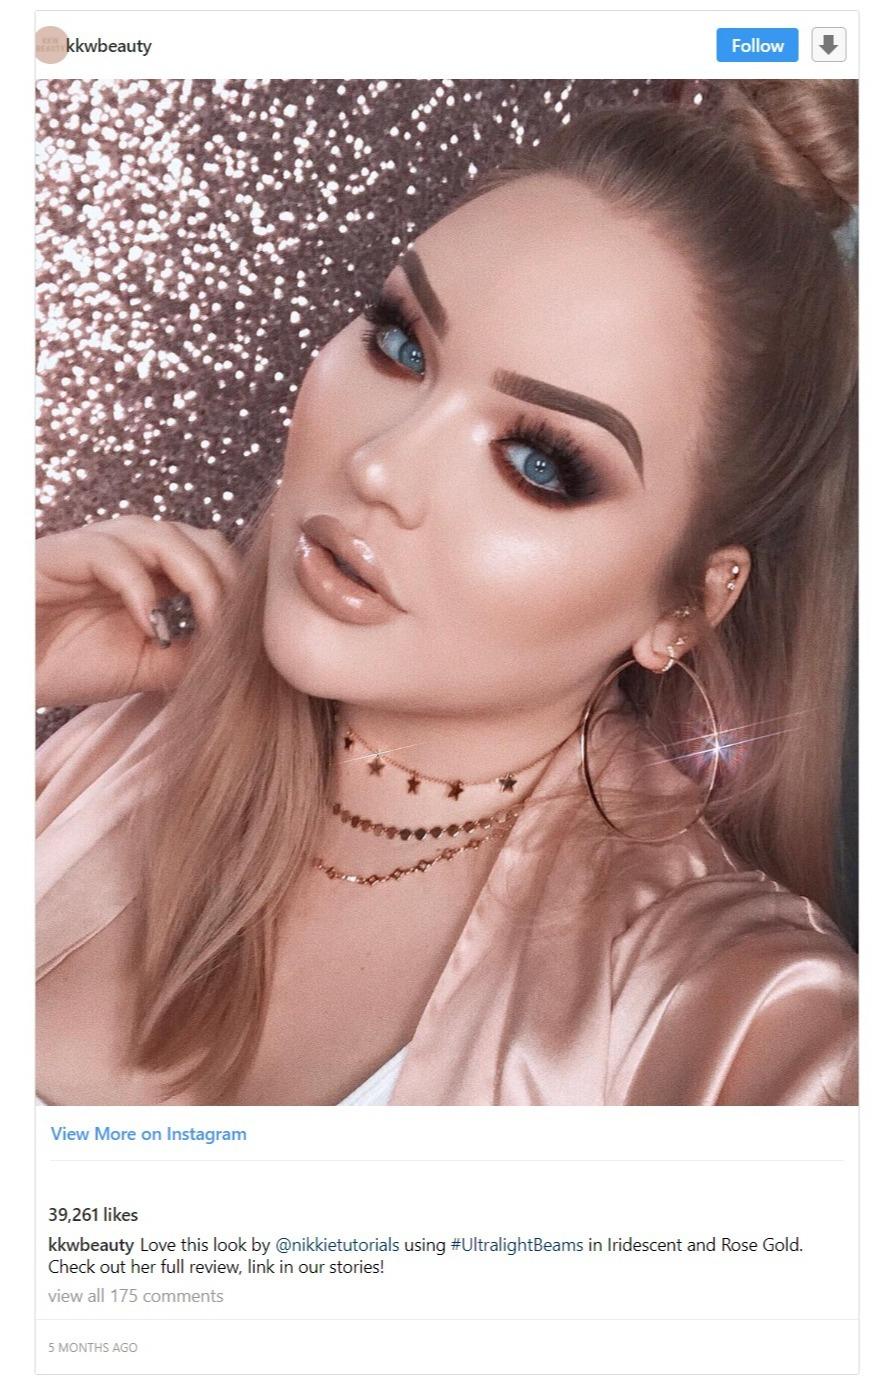 Nikkie De Jager appearing in Kim Kardashian West's Instagram page, KKW